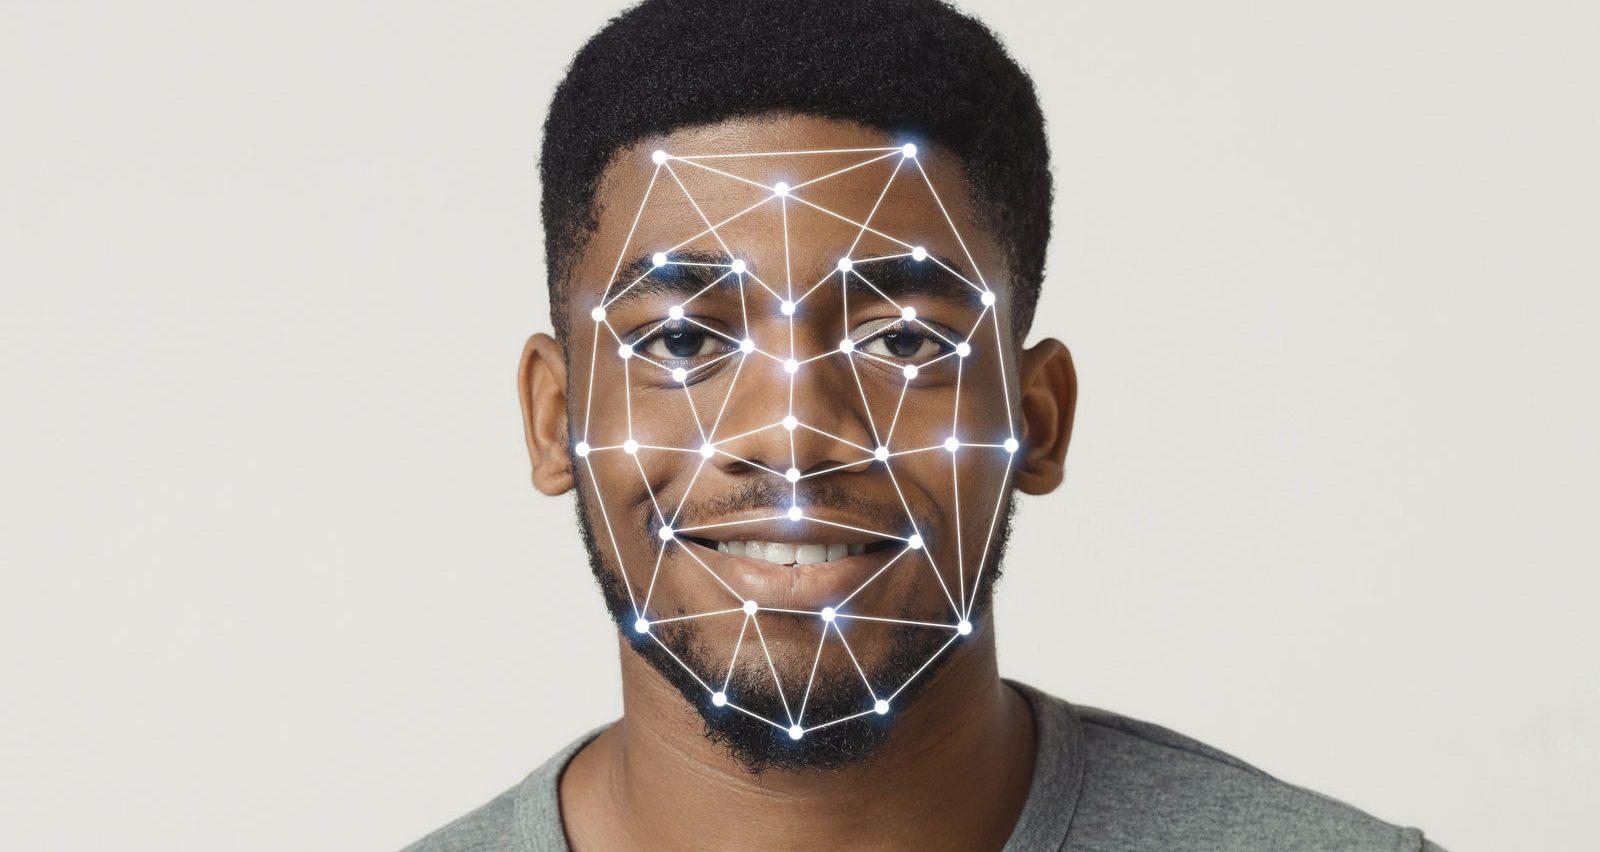 6 Benefits to Switching to Facial Biometrics